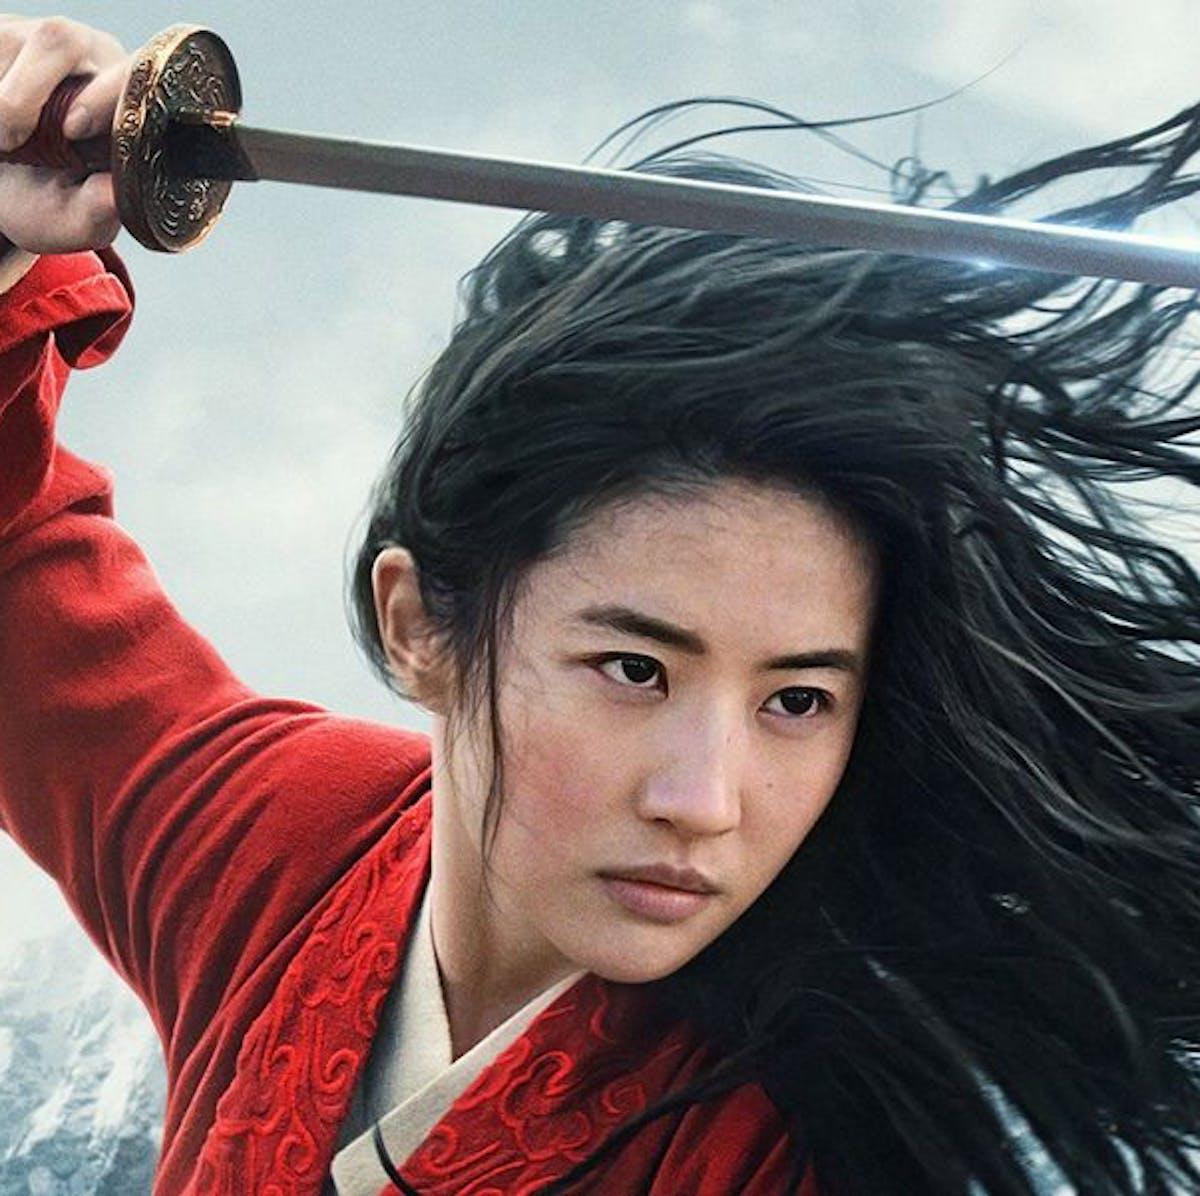 Live-action 'Mulan' trailer confirms no Mushu — and that's a good thing